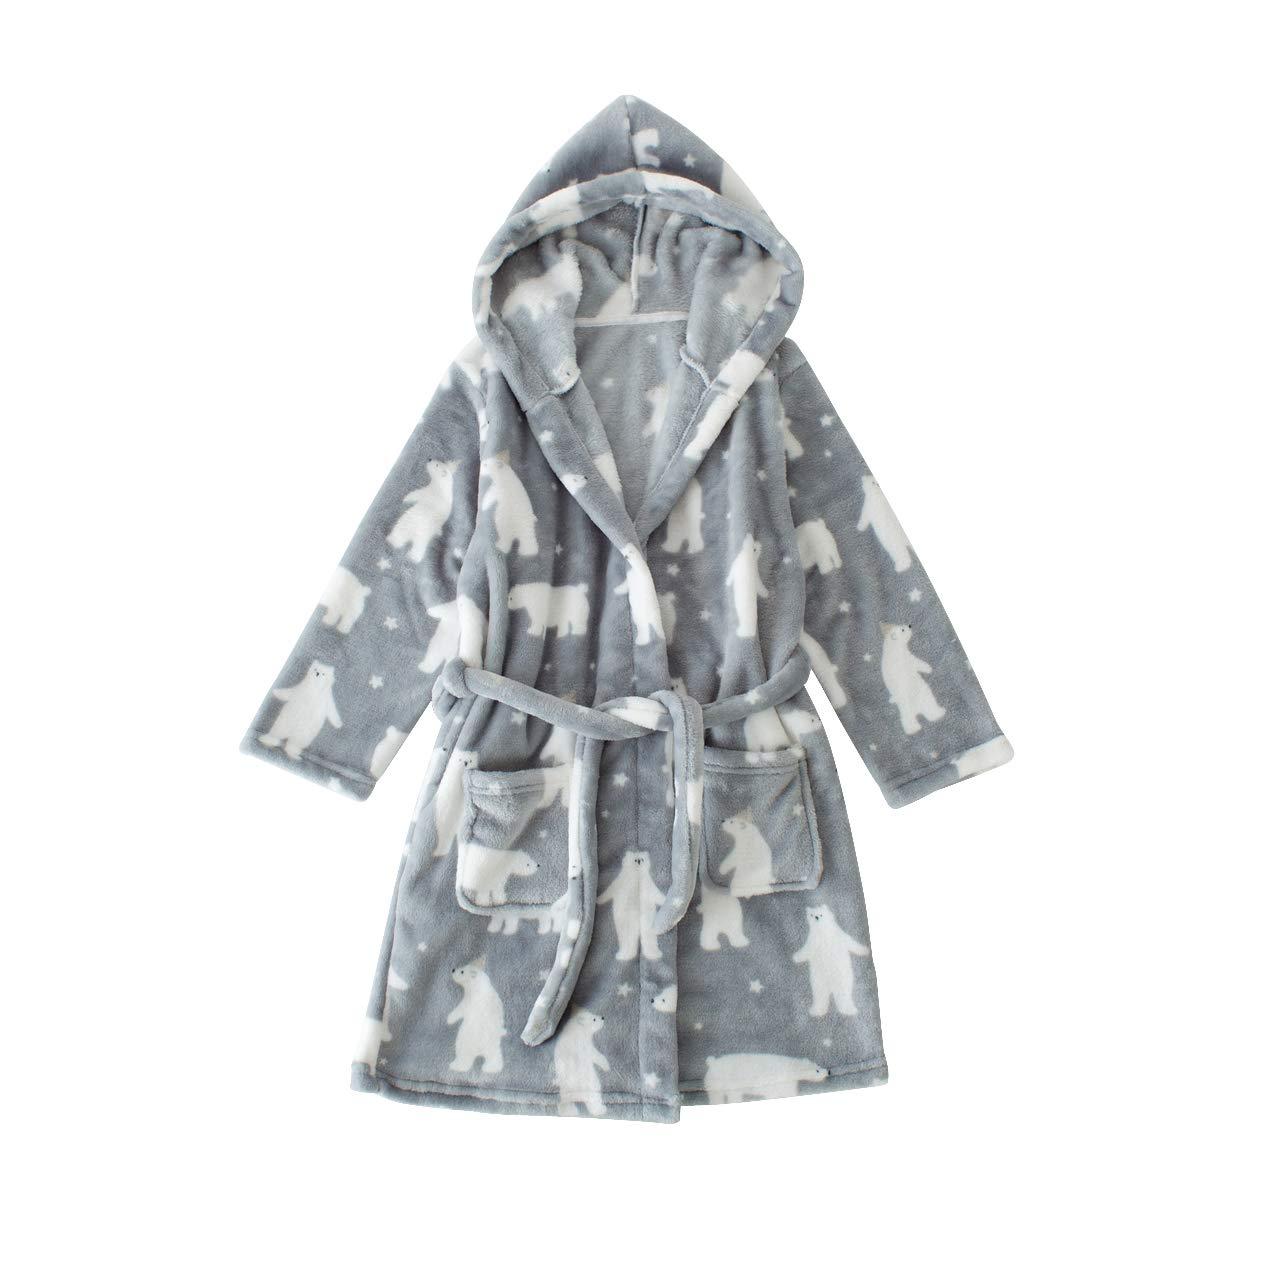 TOLLION Unisex Kids Bathrobe Boys Girls Plush Robe Toddler Hoodie Fleece Robe Sleepwear